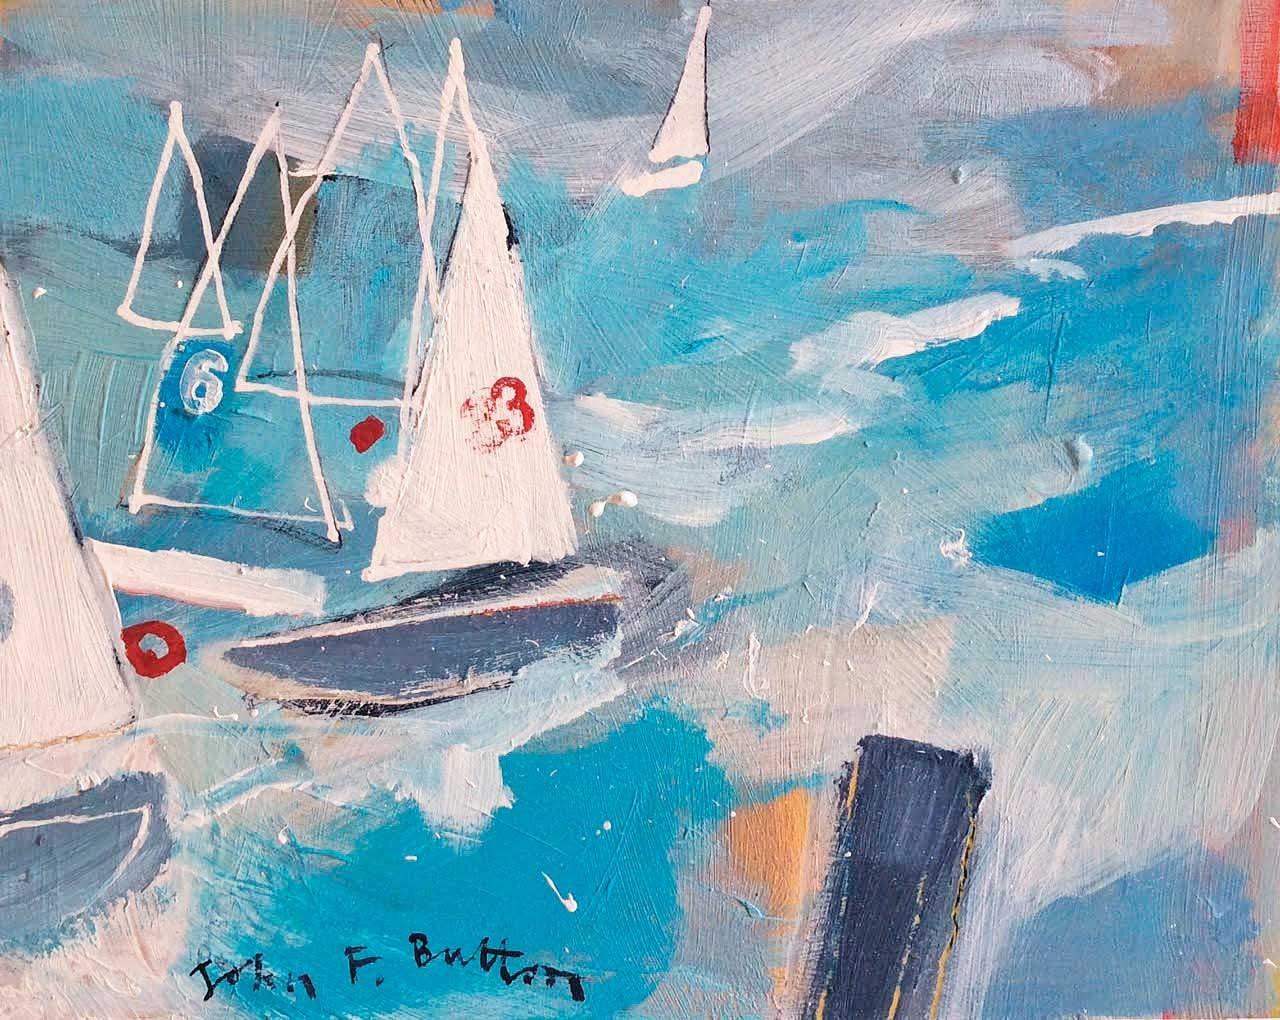 john-button-regatta-study-ii-white-space-art